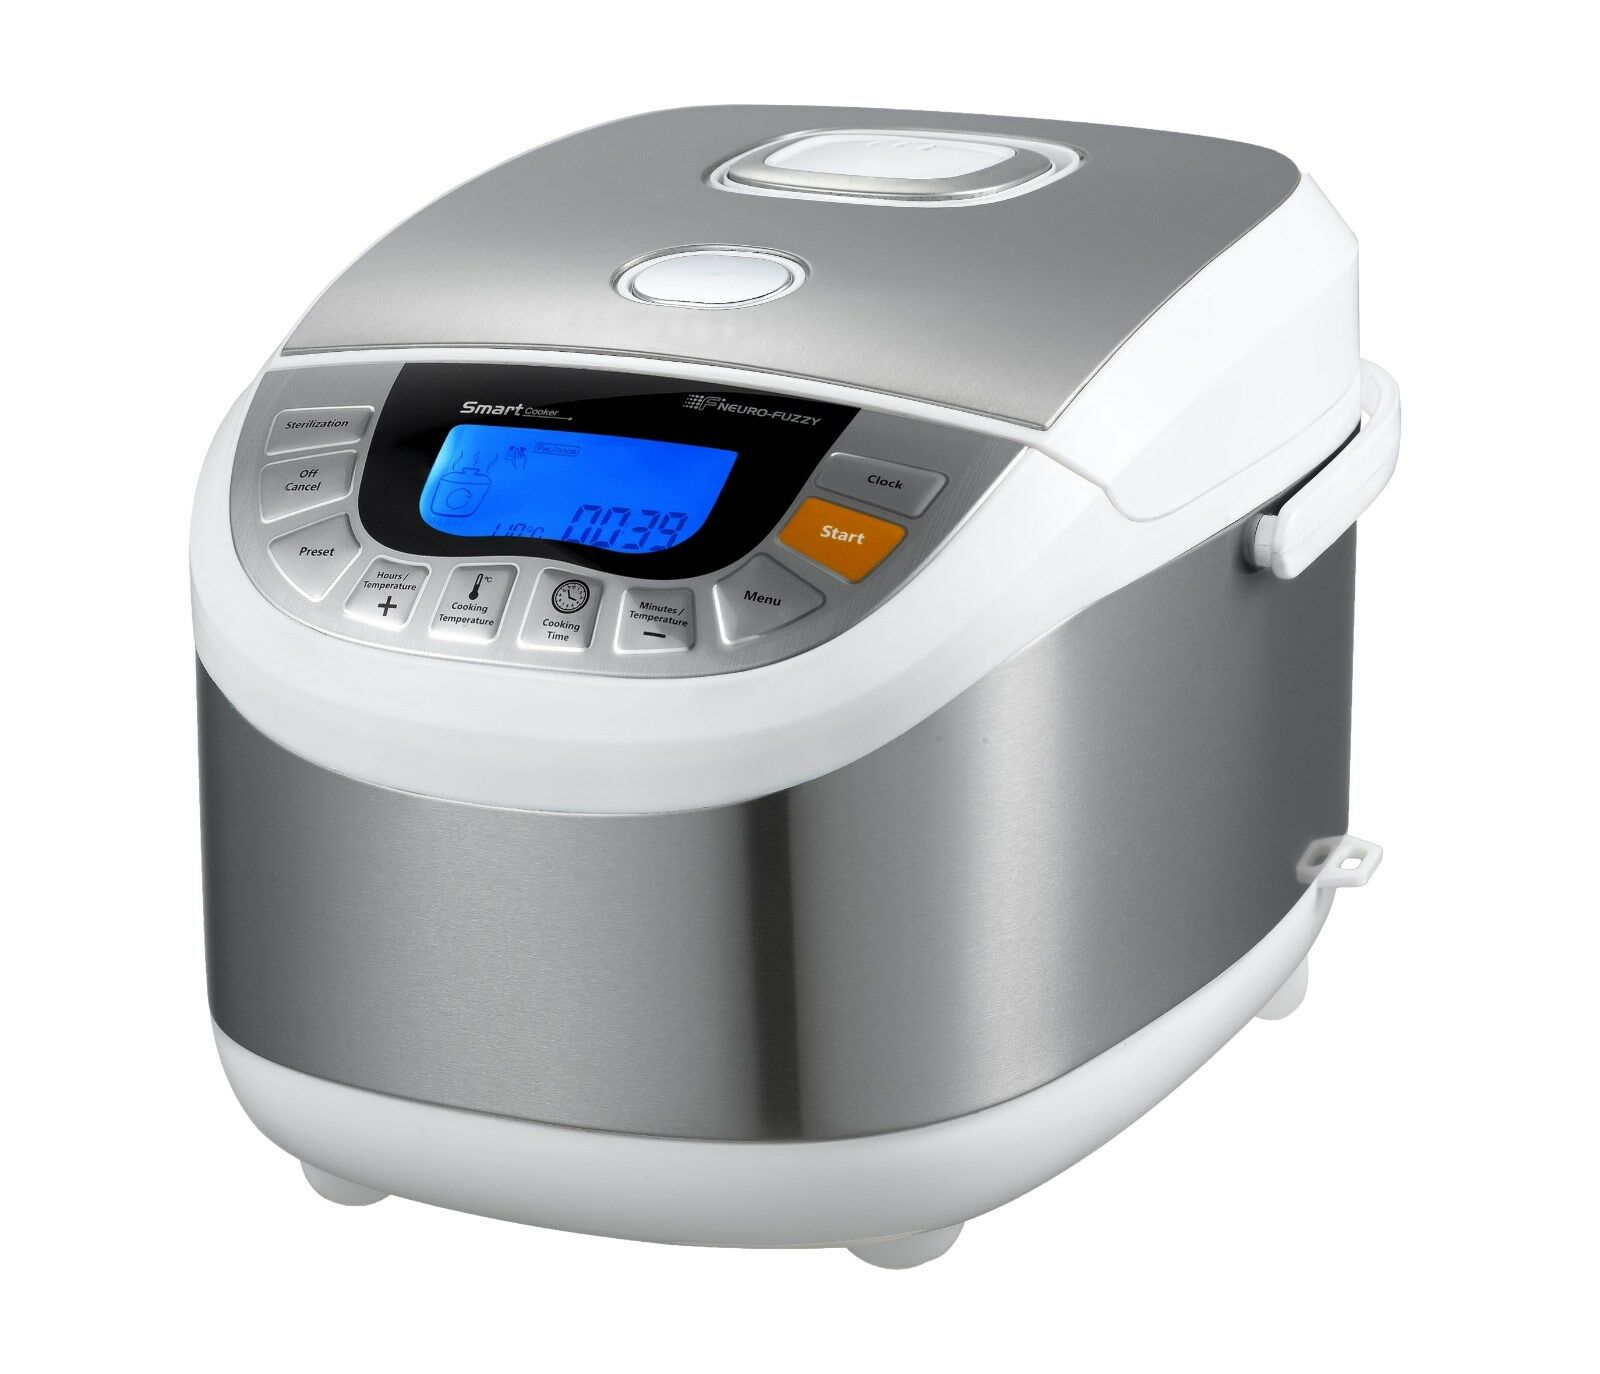 Multivarka 10 Tasse 3D chauffage par induction étroites Robot Chef 65 programmes 110 V